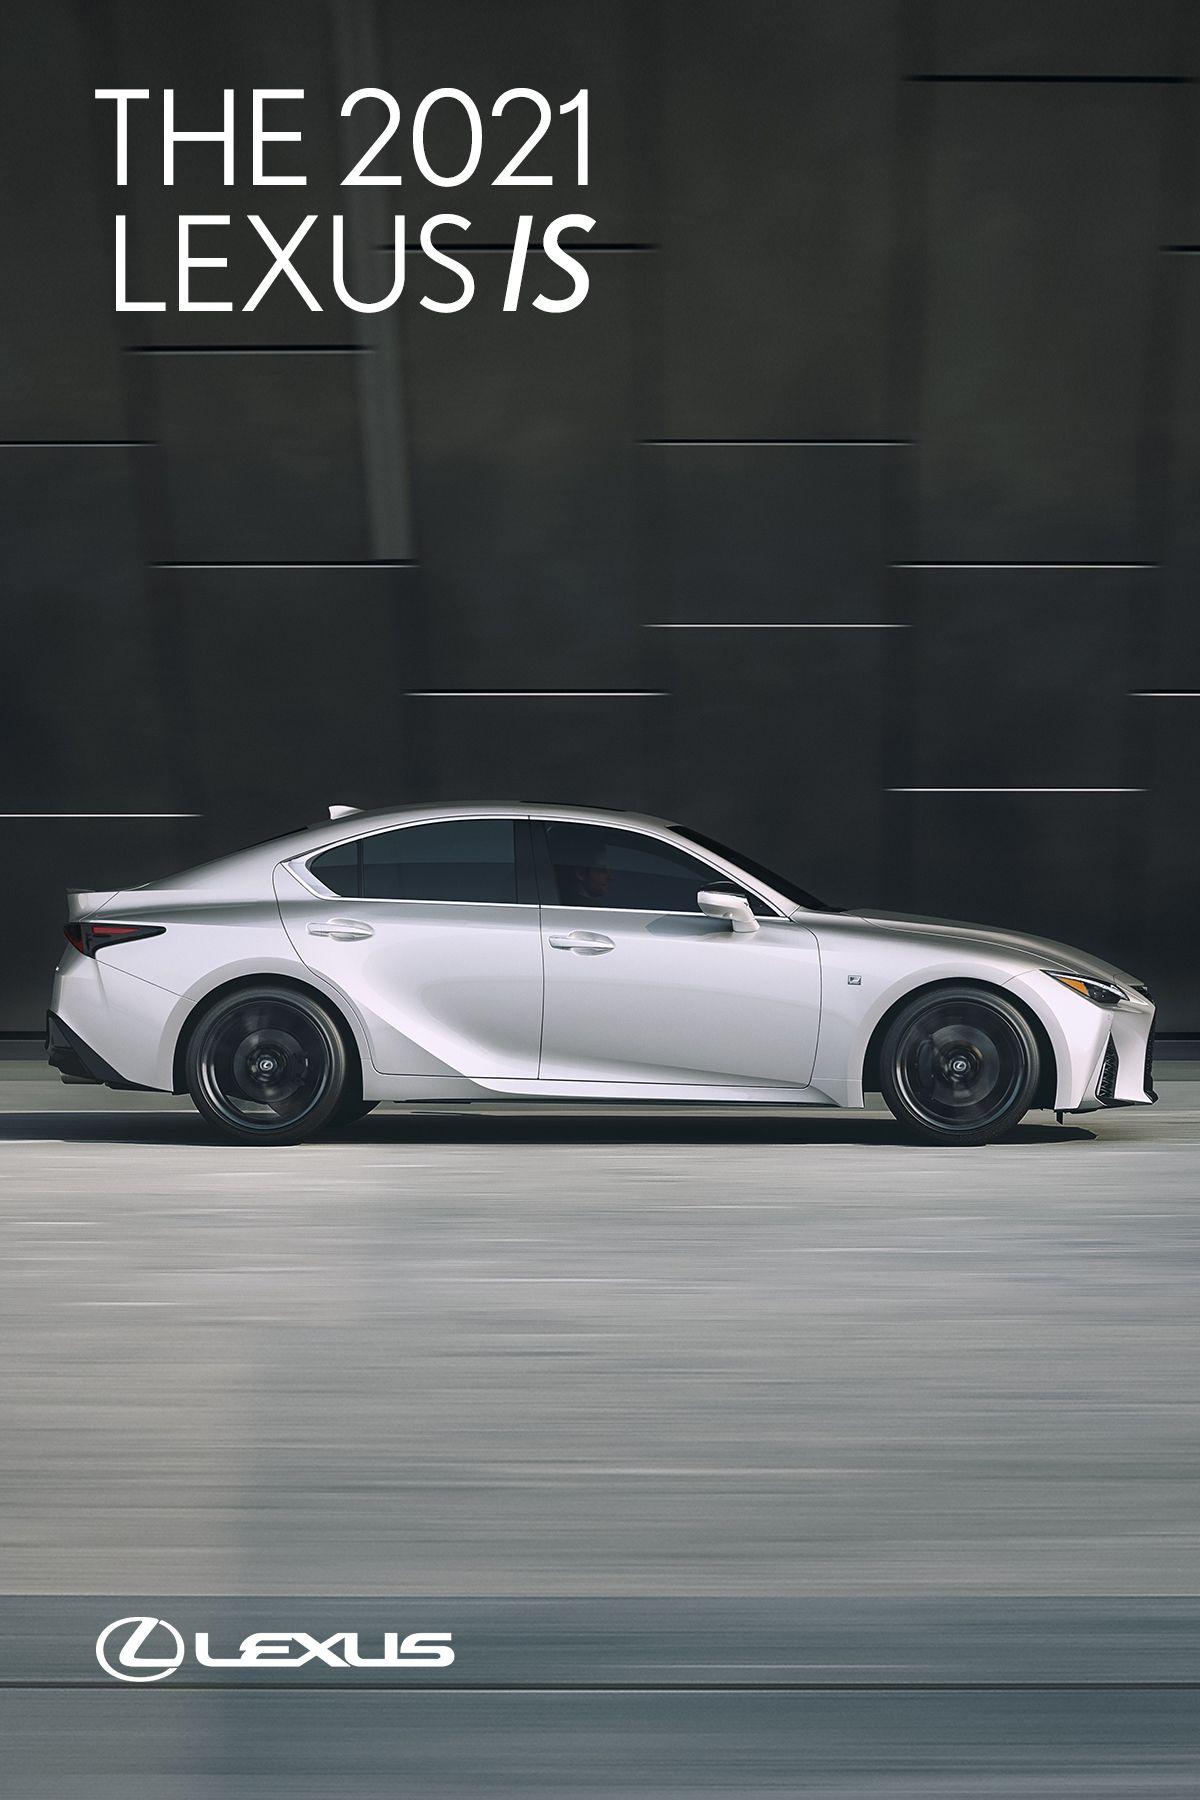 THE 2021 LEXUS IS in 2020 Lexus, Performance driving, Car